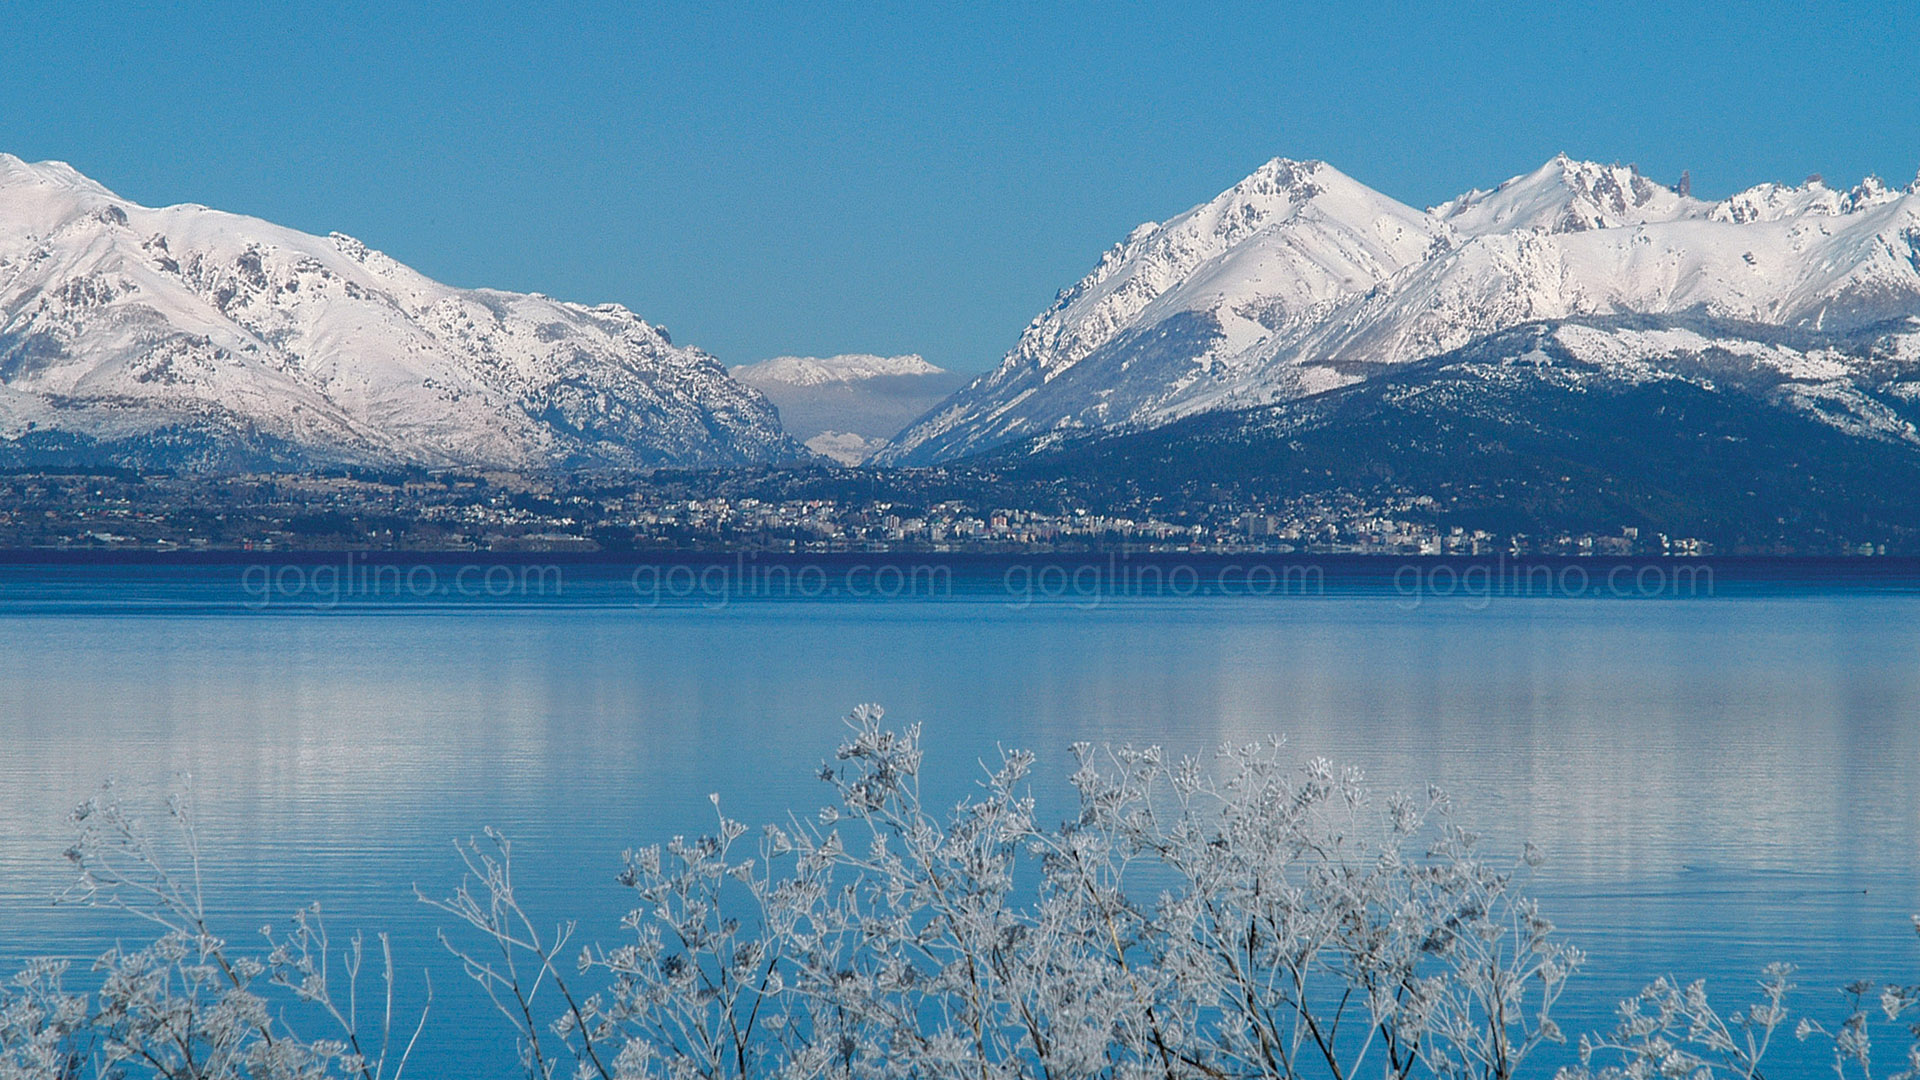 San Carlos de Bariloche Argentina  city images : San Carlos de Bariloche Argentina